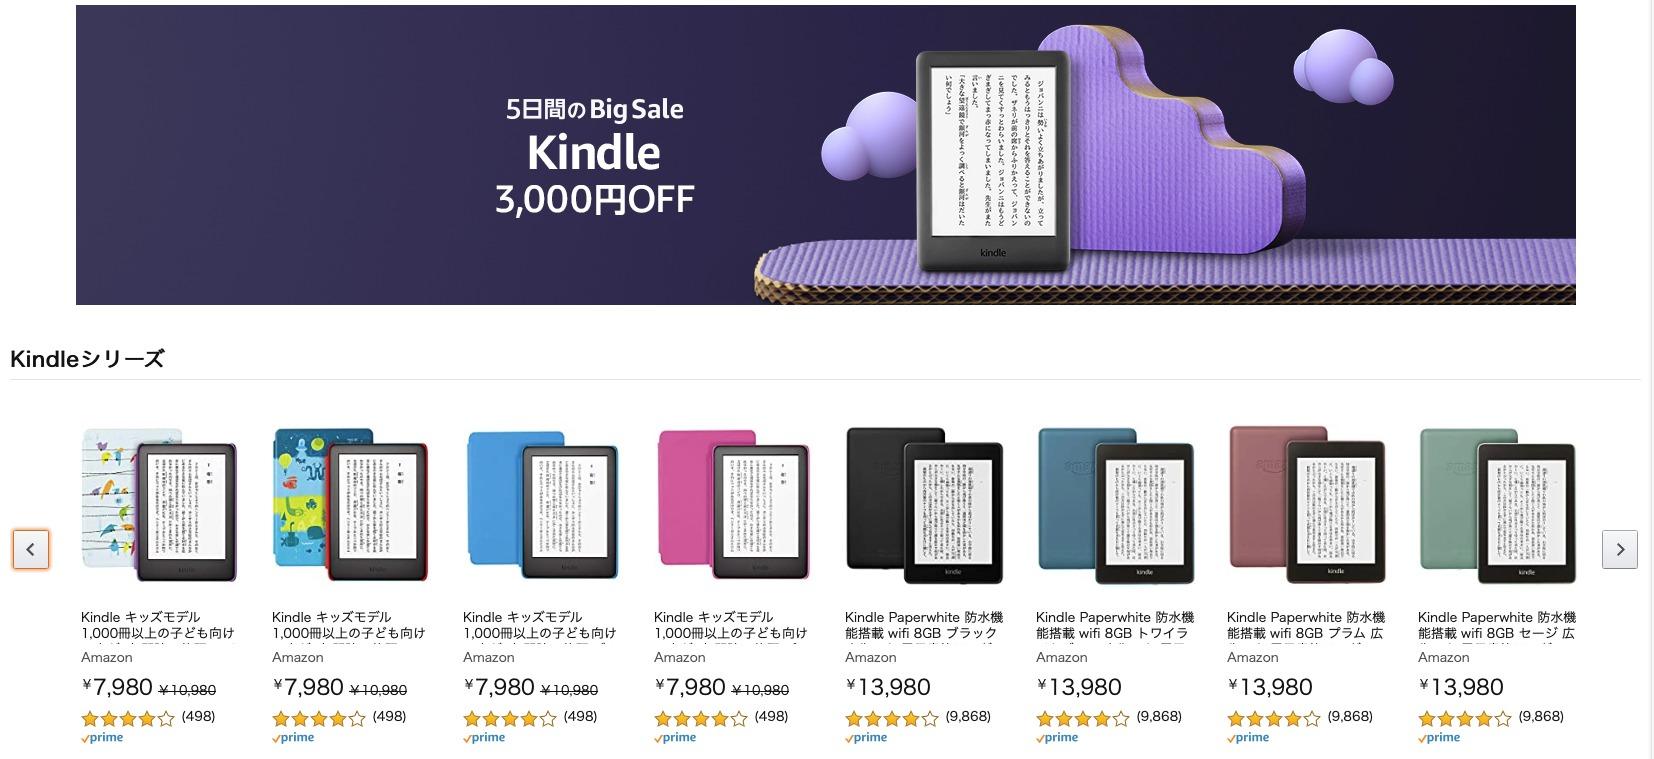 Amazon Amazonブラックフライデー&サイバーマンデーセール